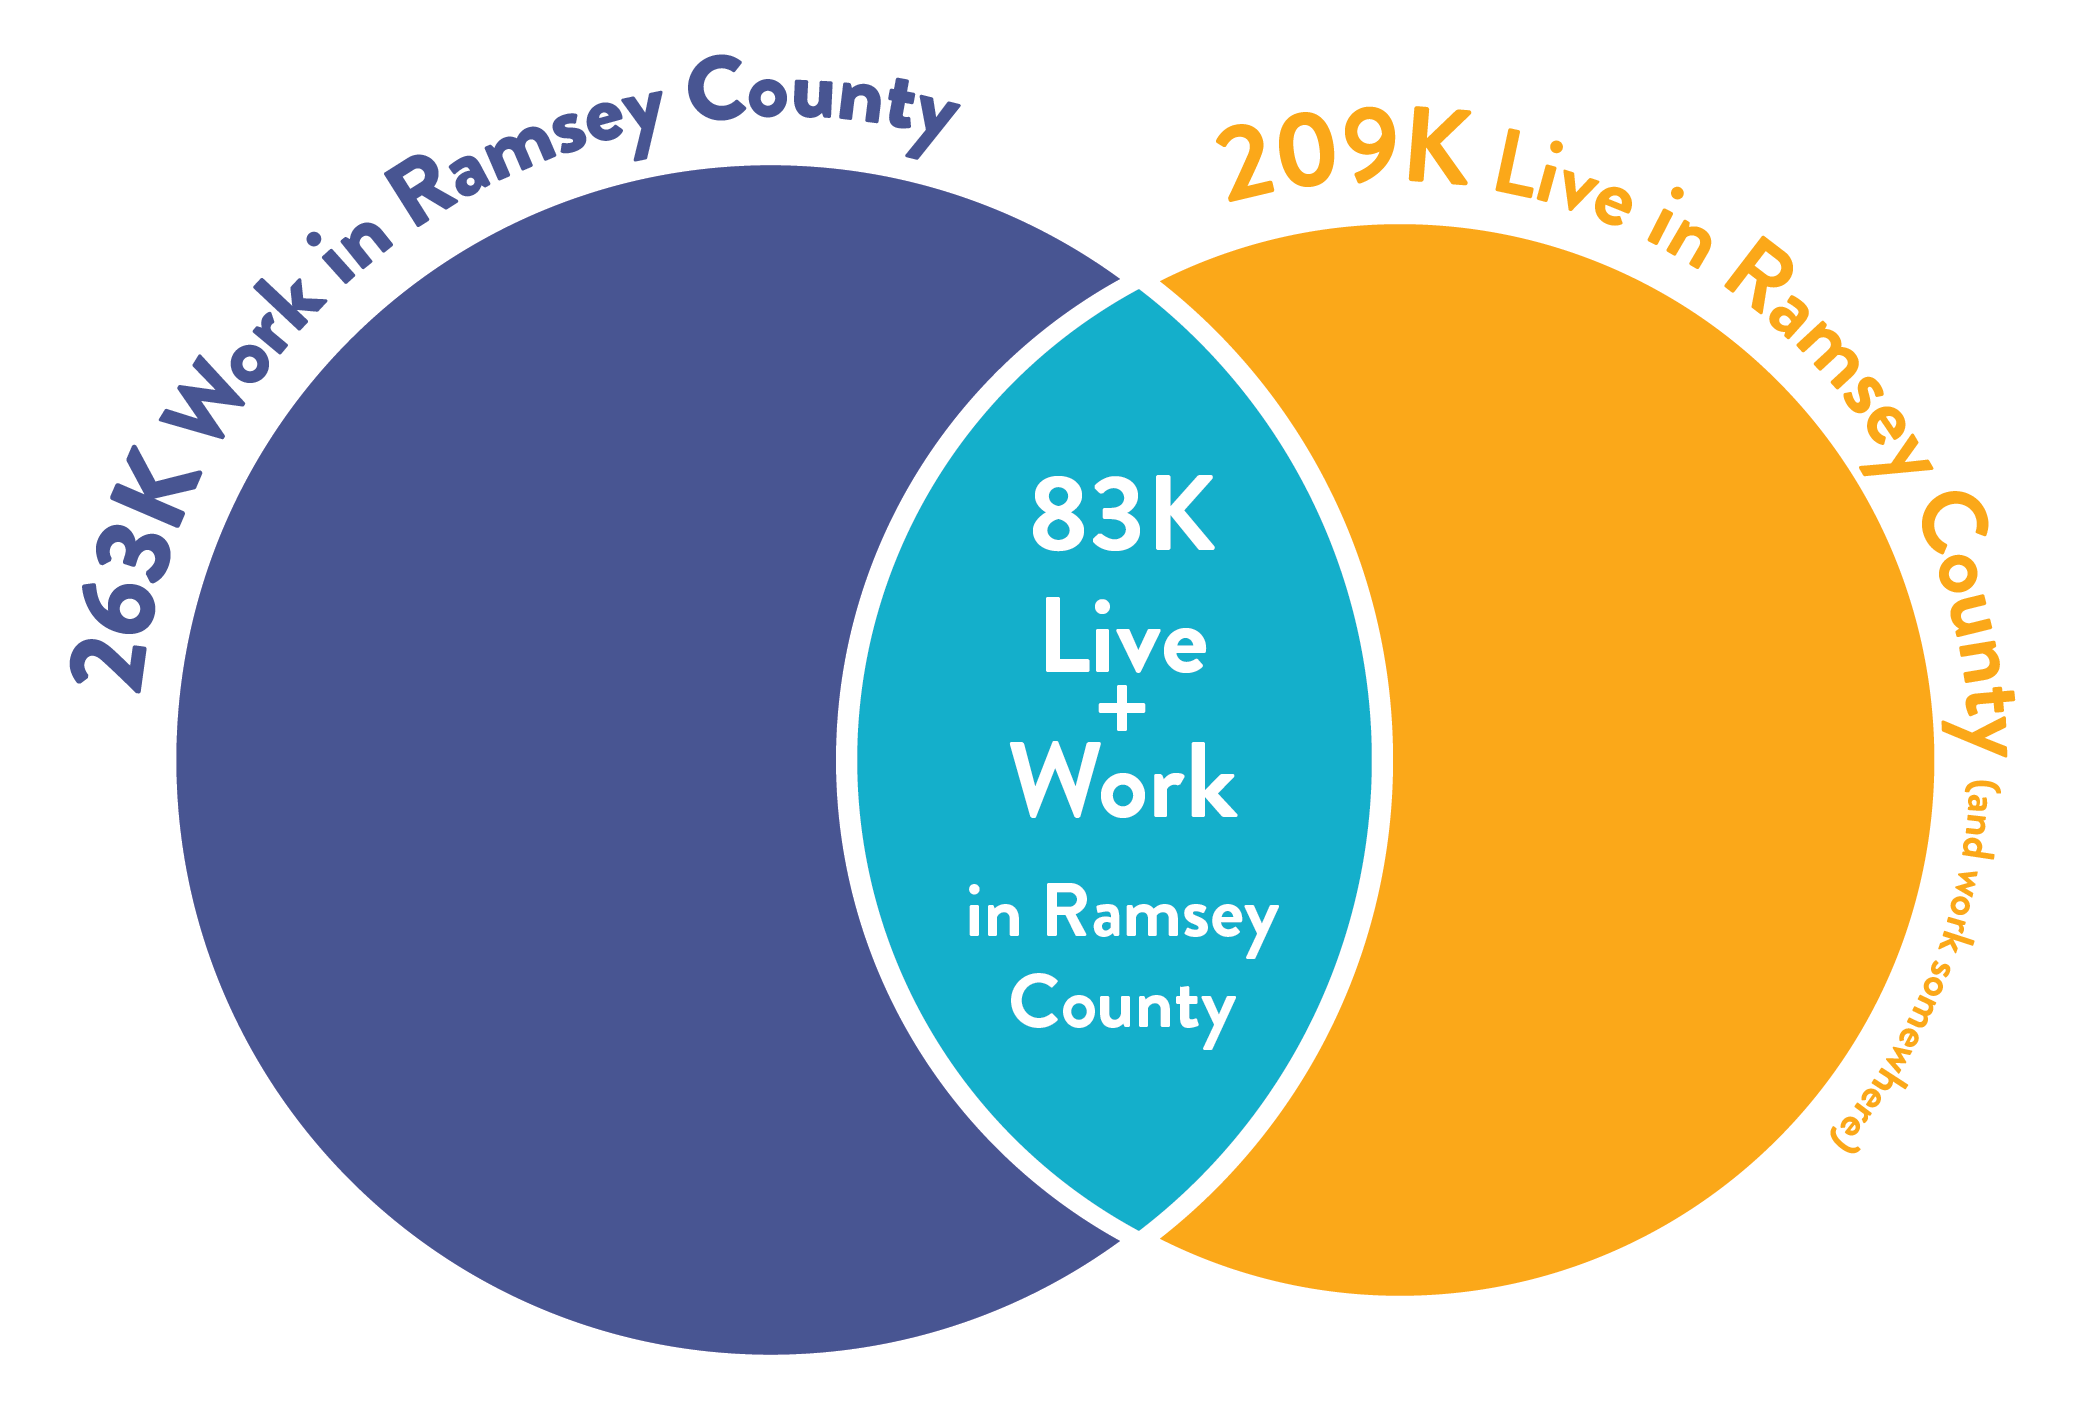 Ramsey County Live Work Analysis Venn Diagram